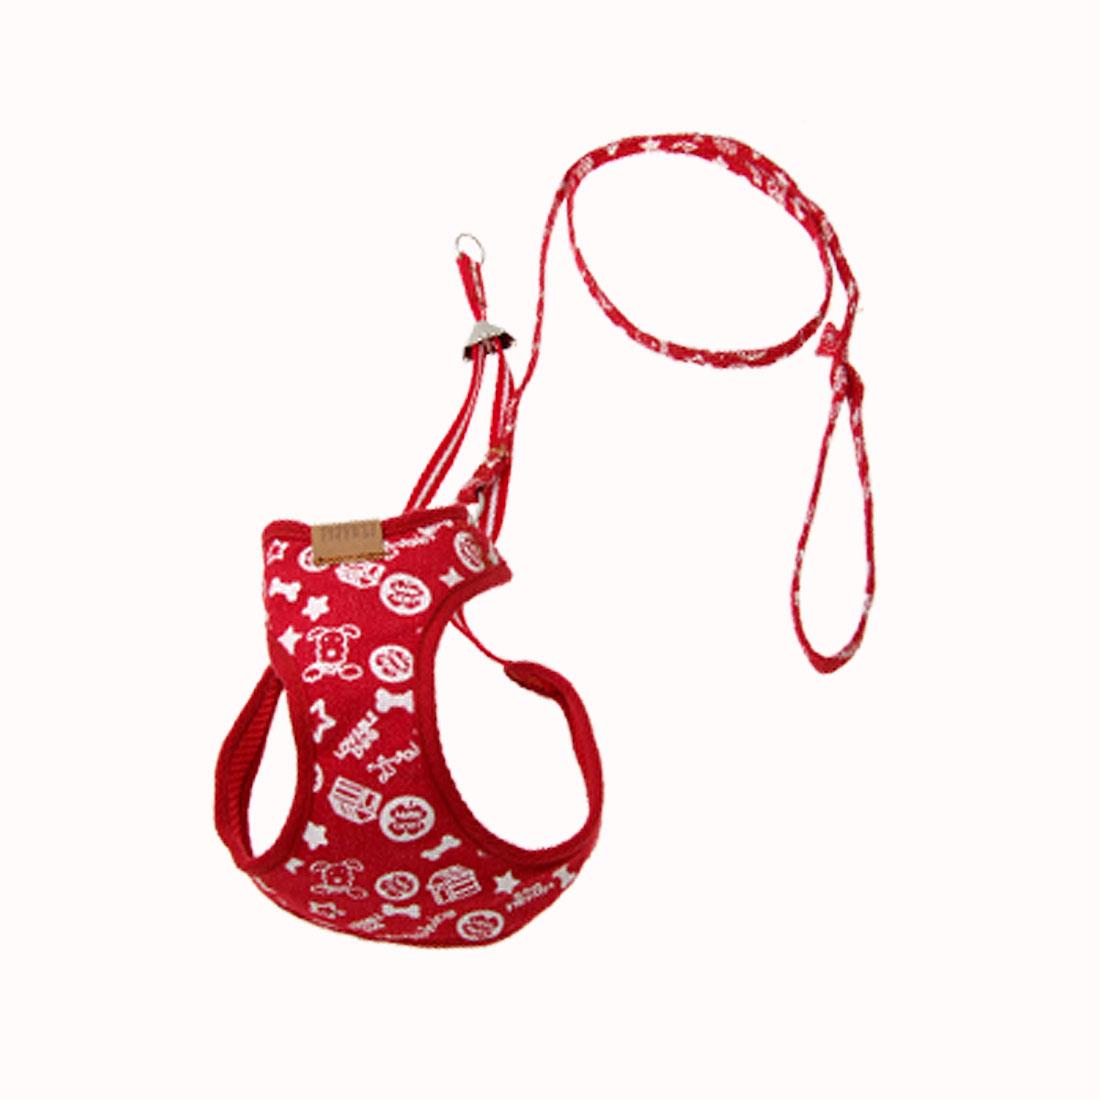 Size 4 Mesh Cat Puppy Doggle Doggie Pet Dog Vest Harness w/Leash